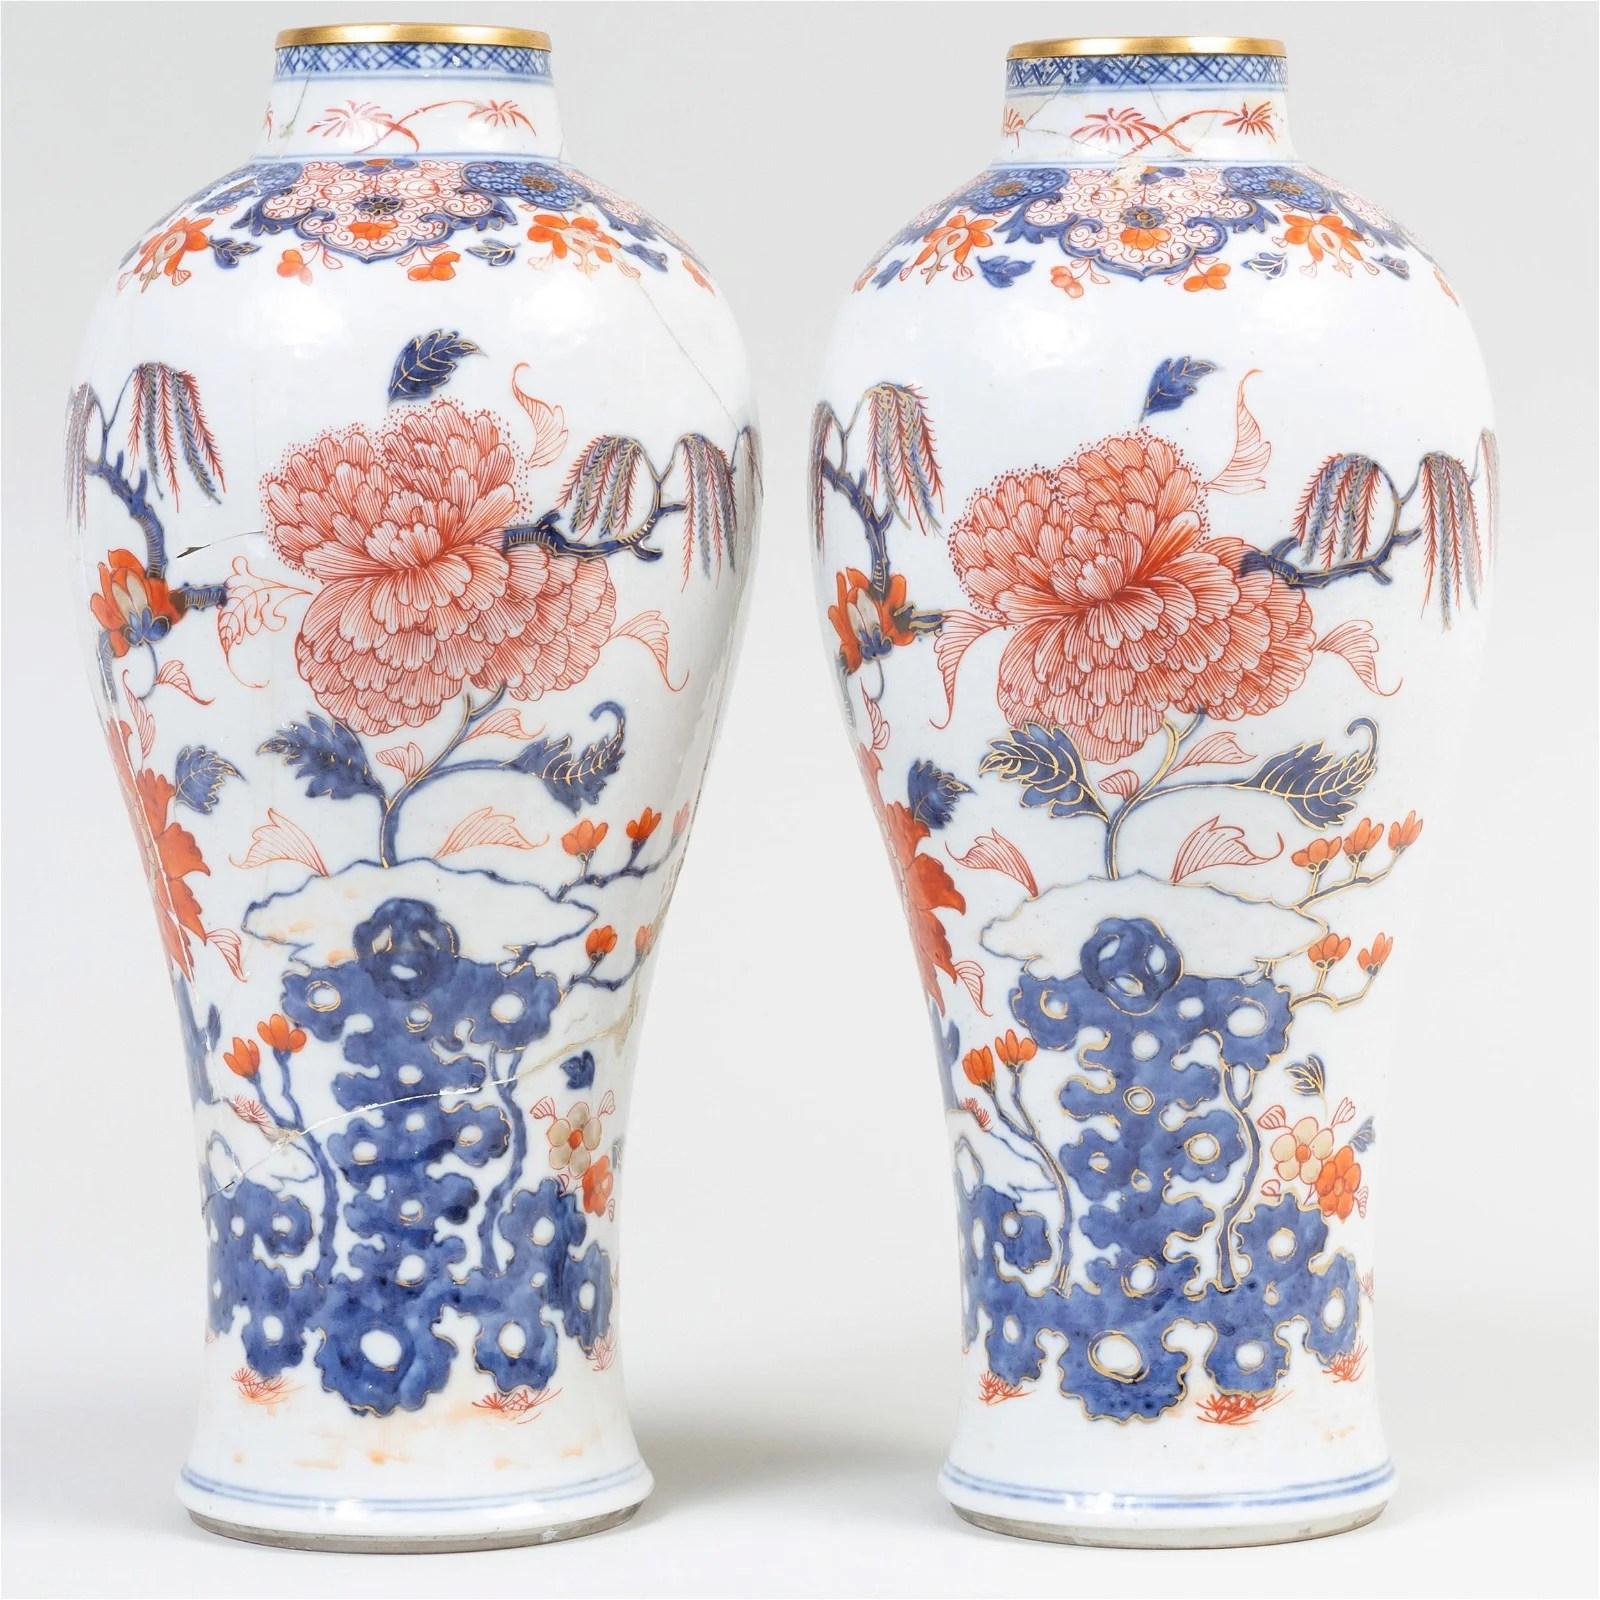 Pair of Chinese Export Imari Jars with Later Metal